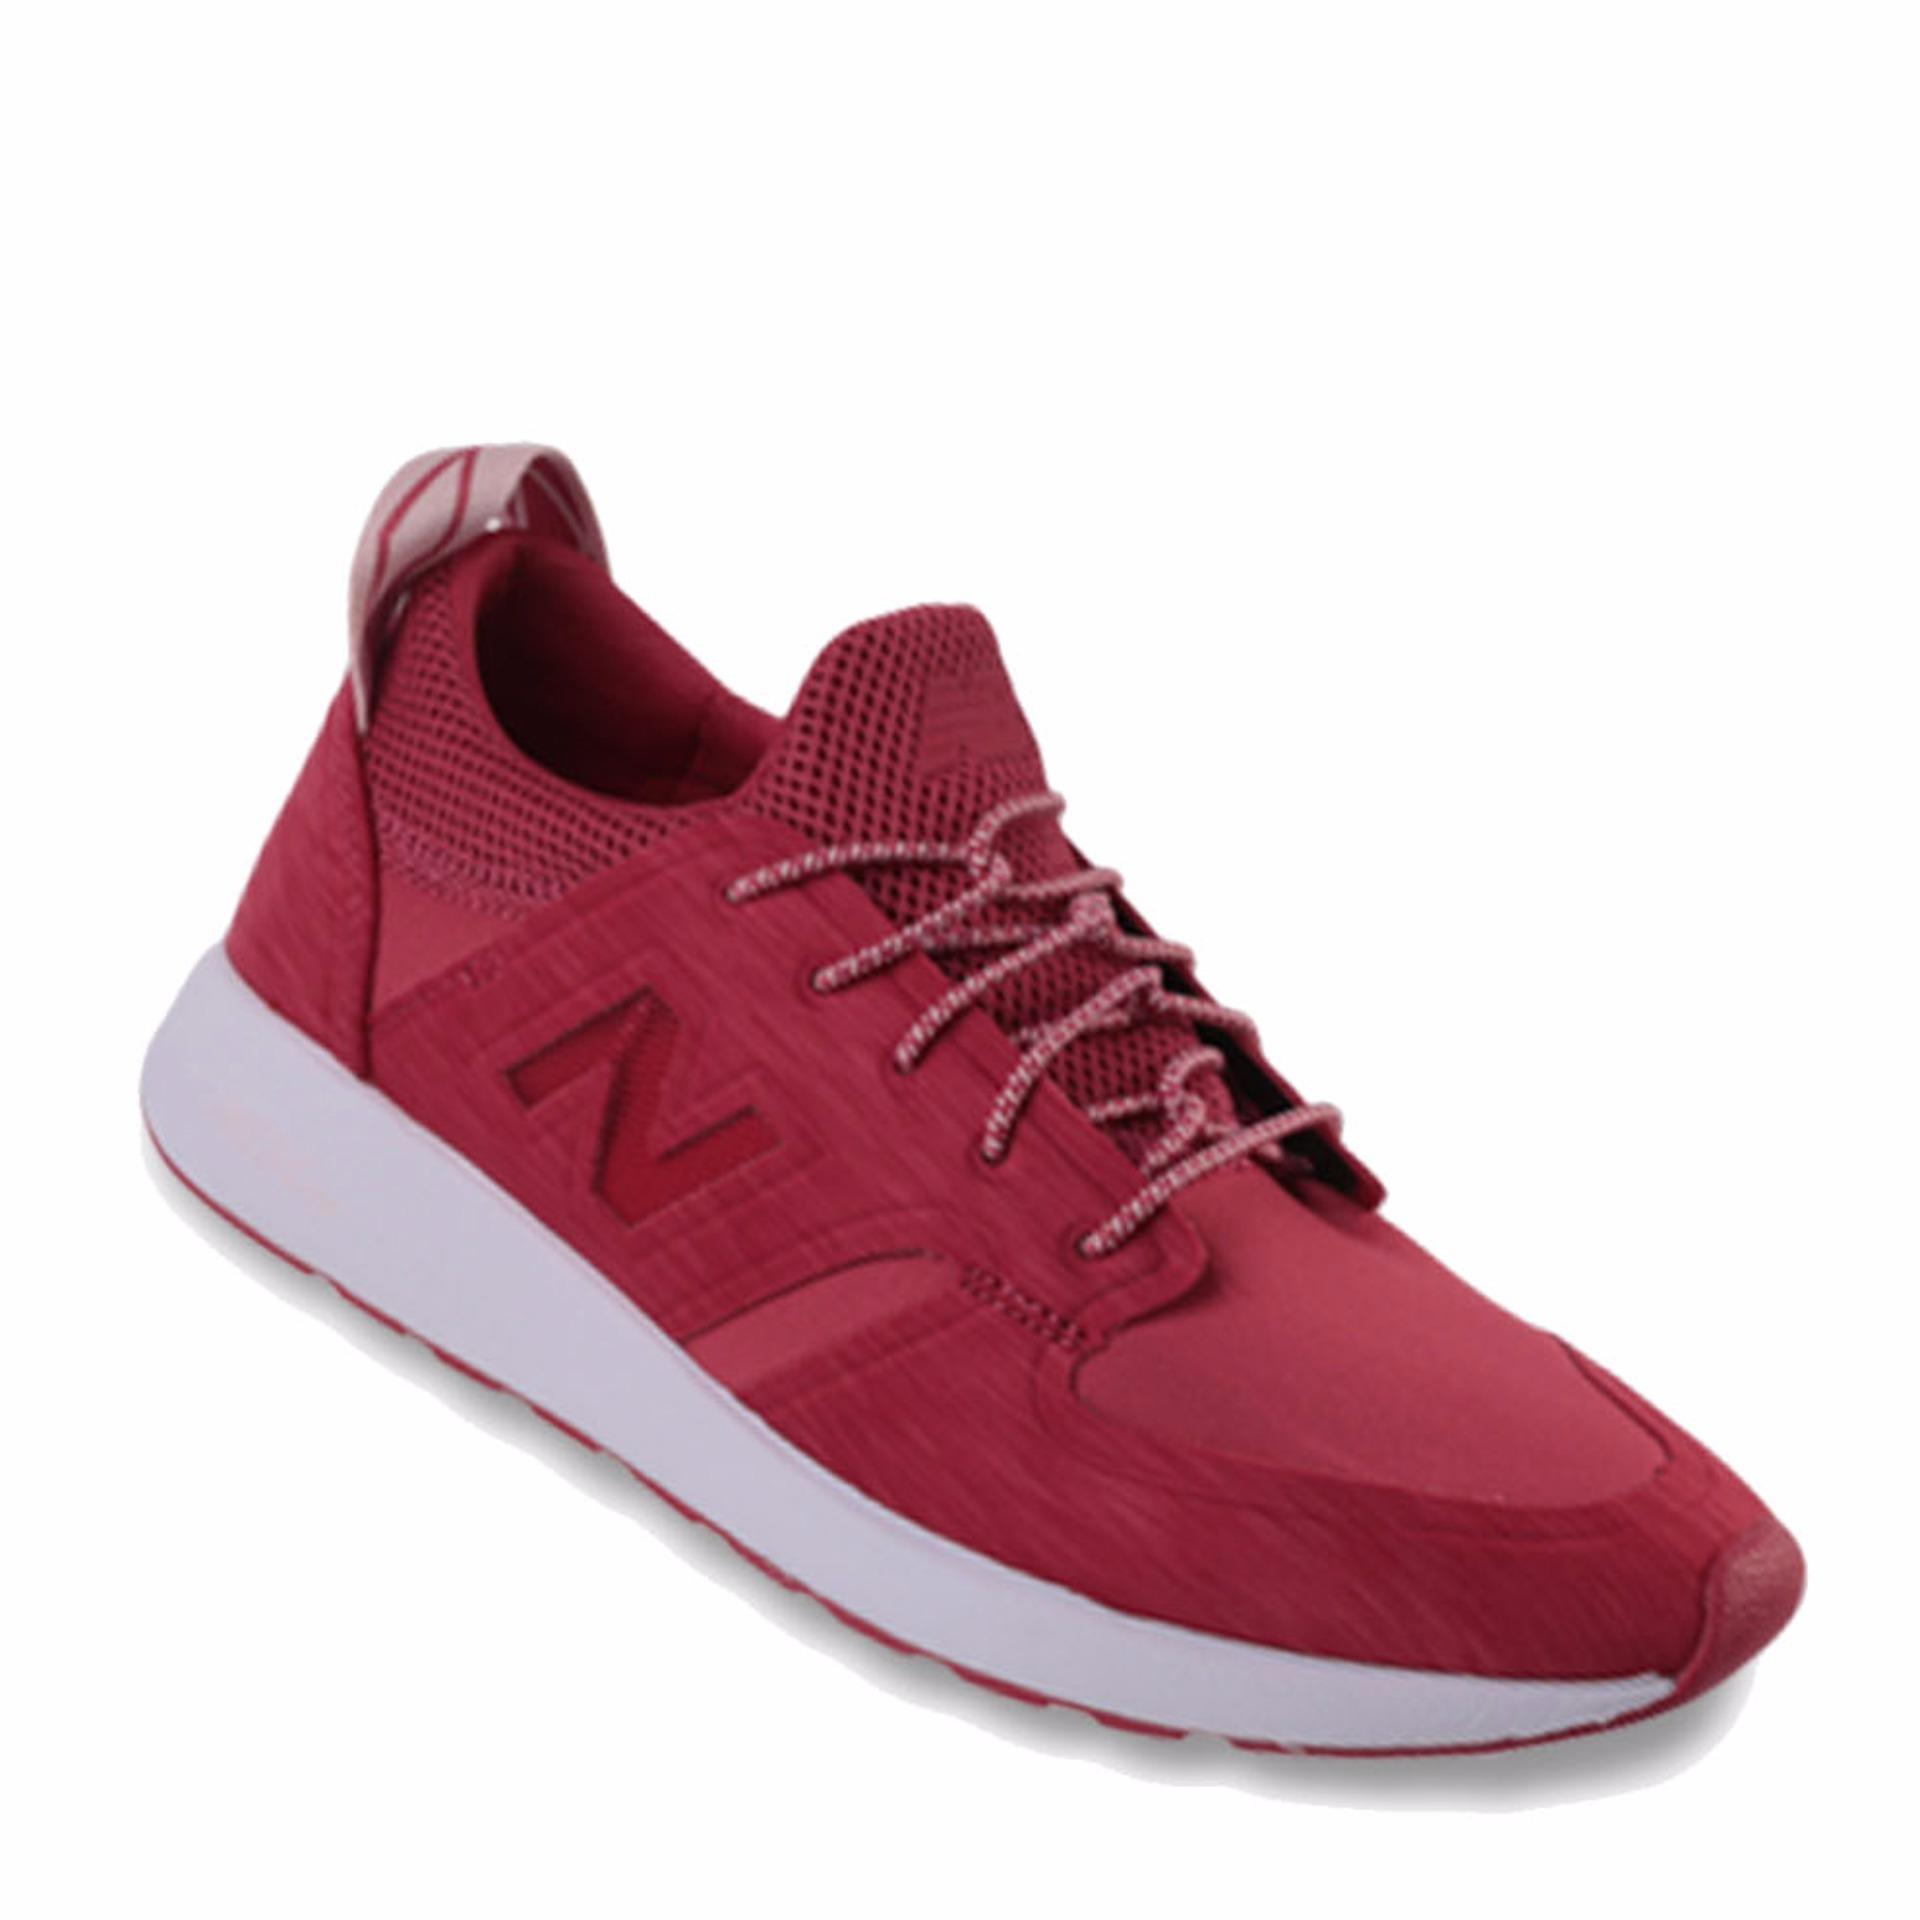 Beli New Balance 420 Sepatu Wanita Merah New Balance Dengan Harga Terjangkau